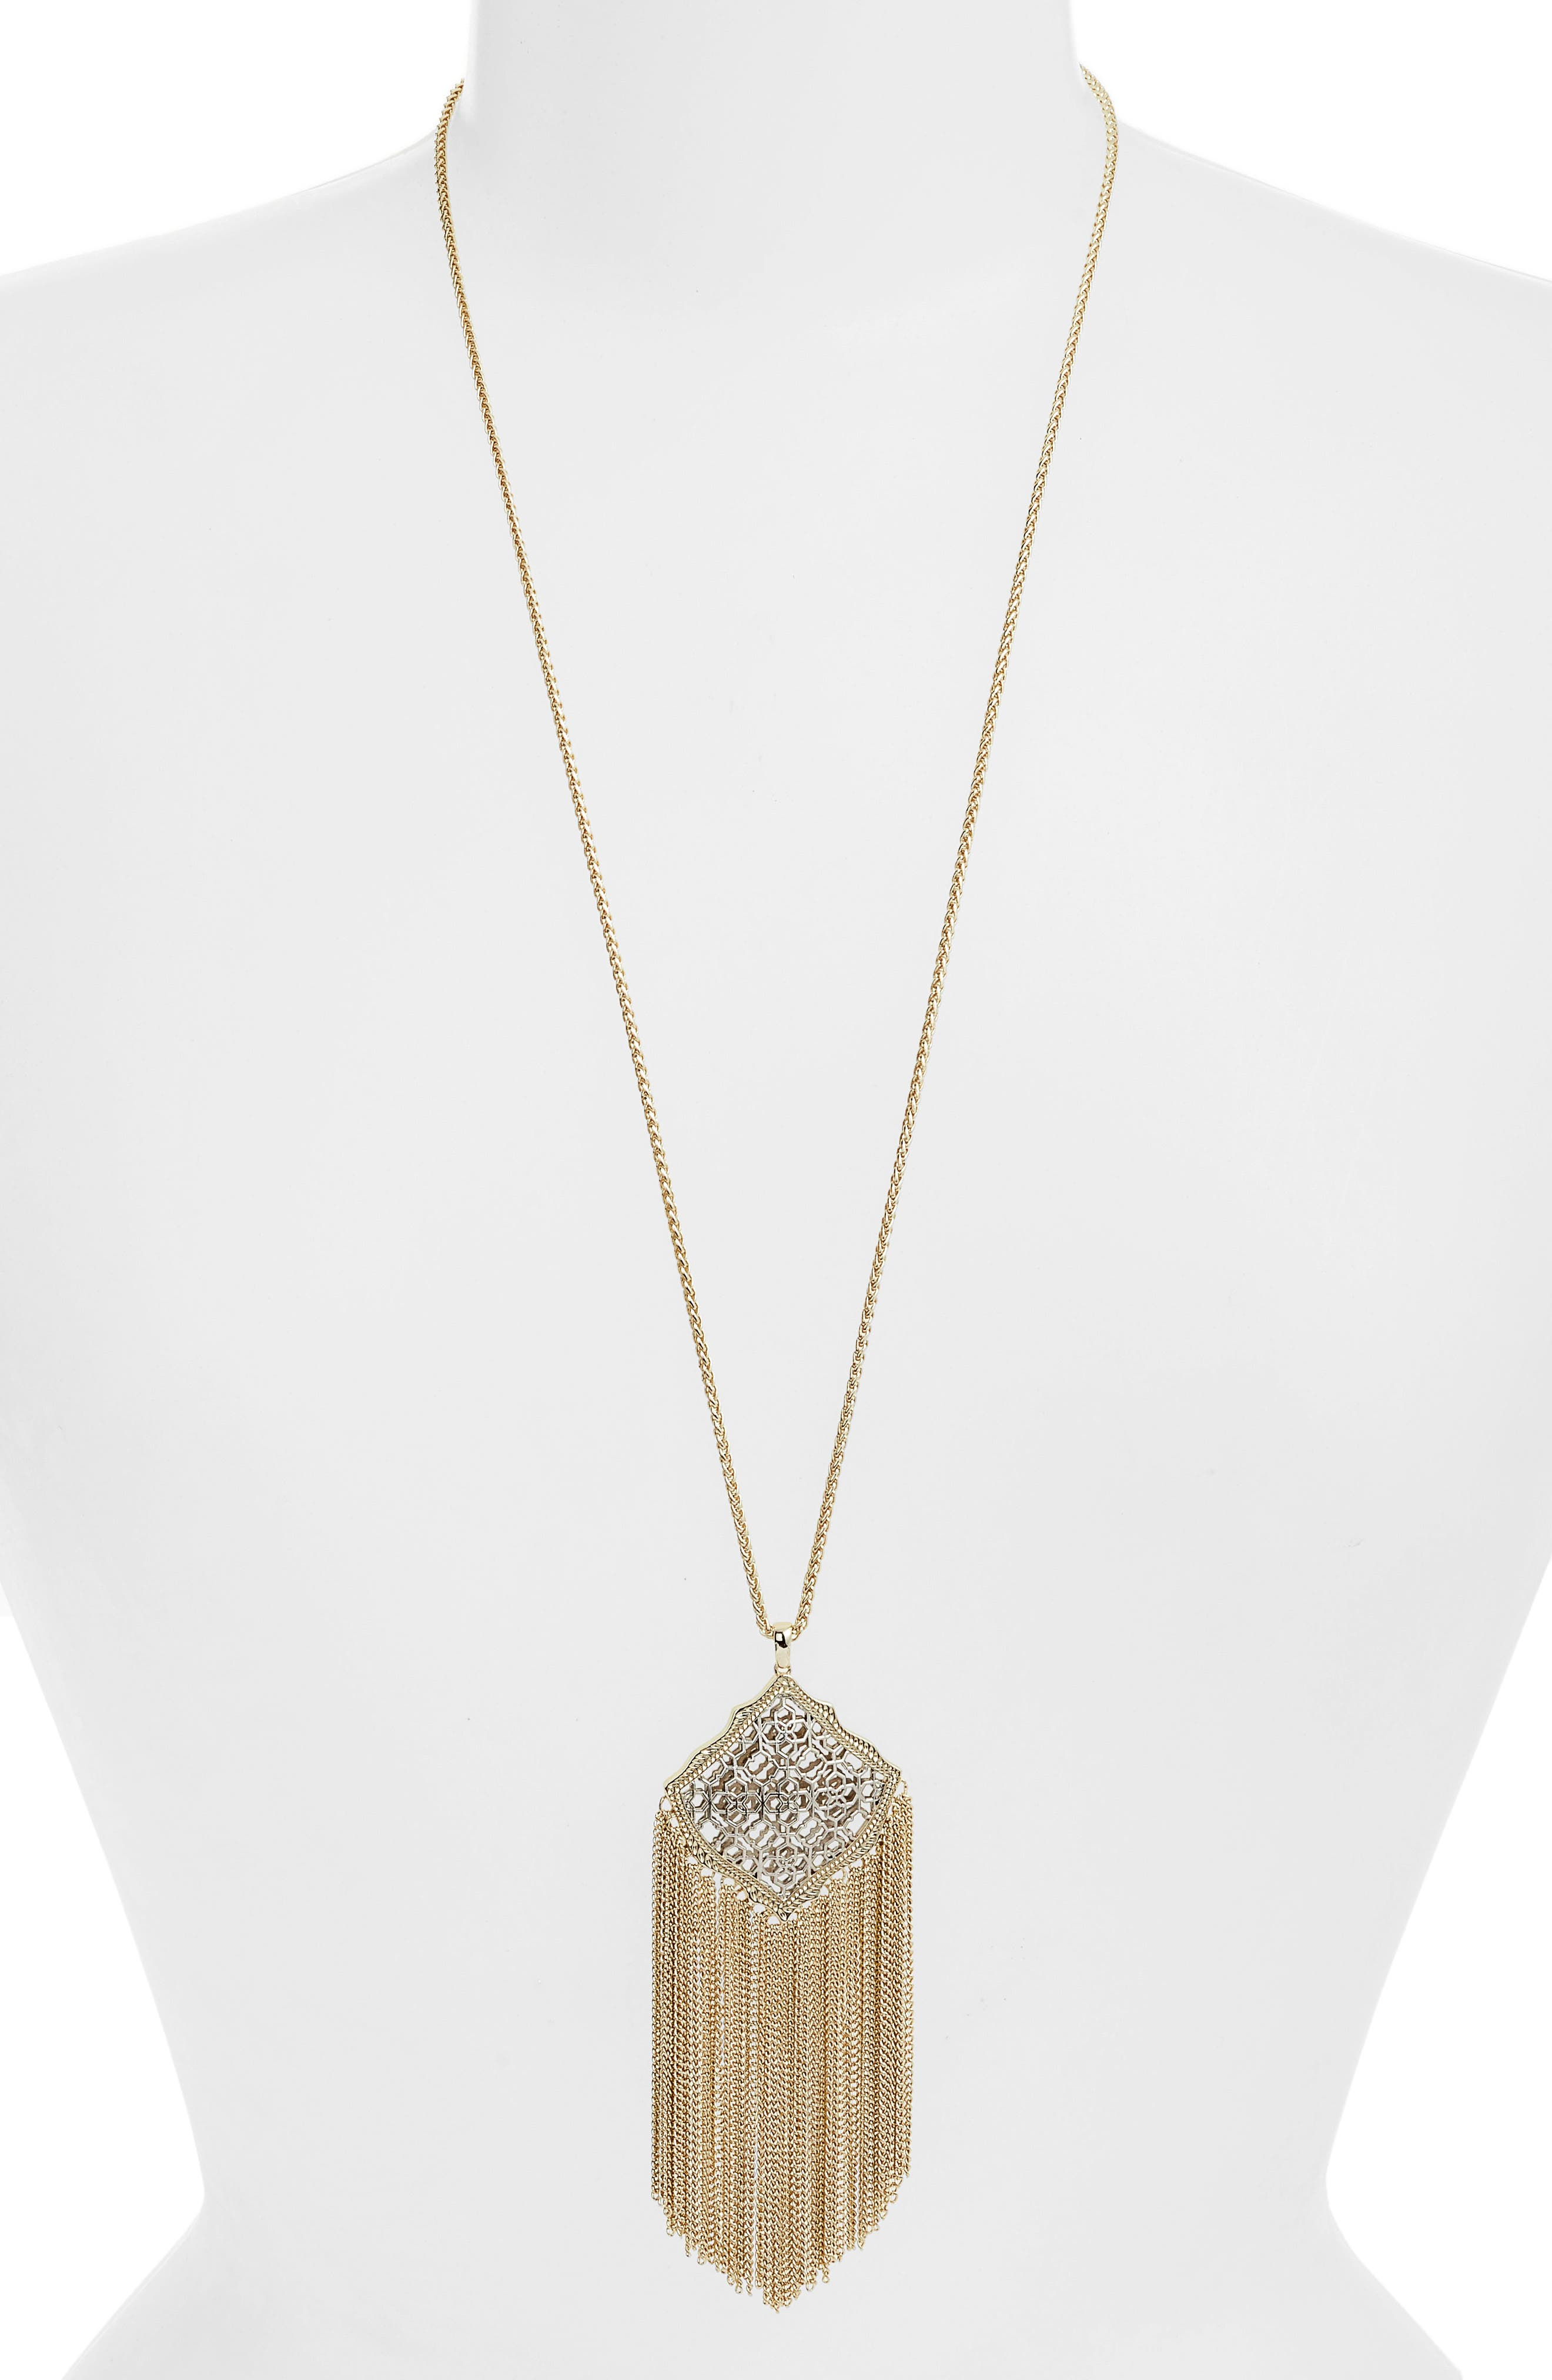 Kingston Adjustable Pendant Necklace,                             Main thumbnail 1, color,                             SILVER FILIGREE/ GOLD